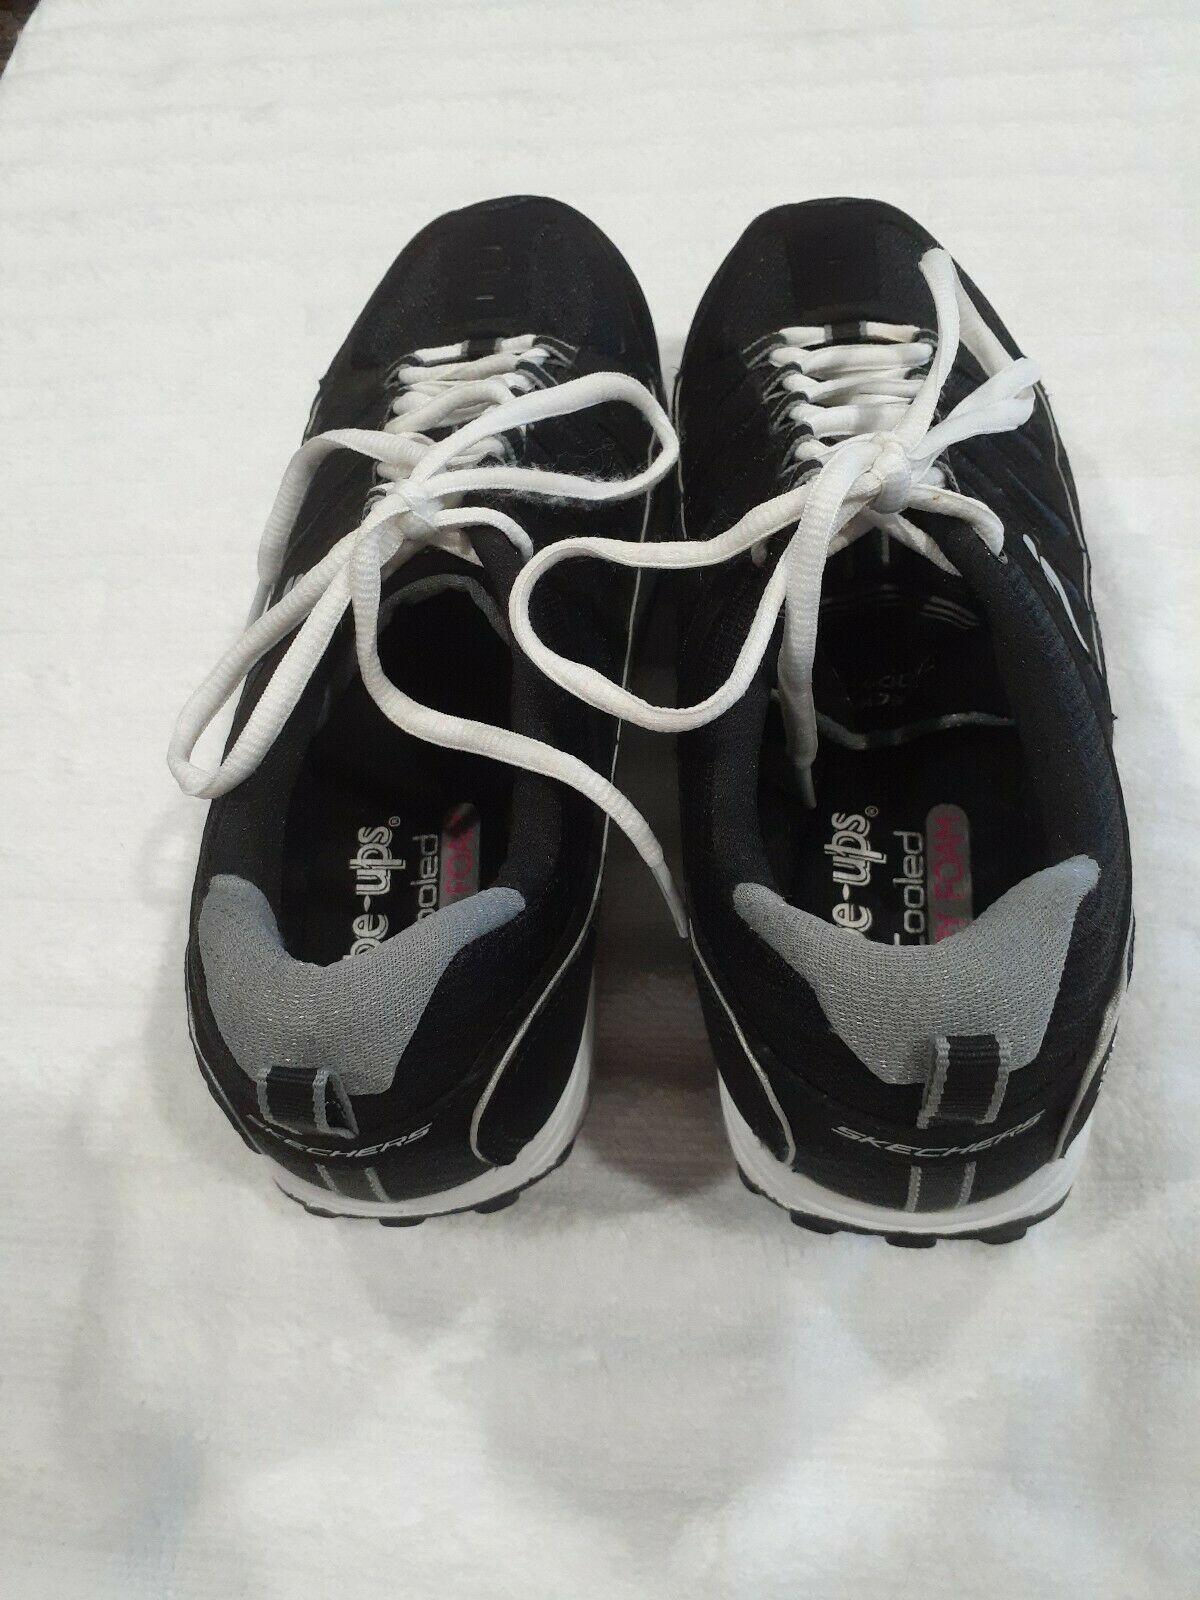 Womens Sz 9.5 M Skechers Shape-Ups Comfort Stride Shoes Sneakers Black & Silver image 10